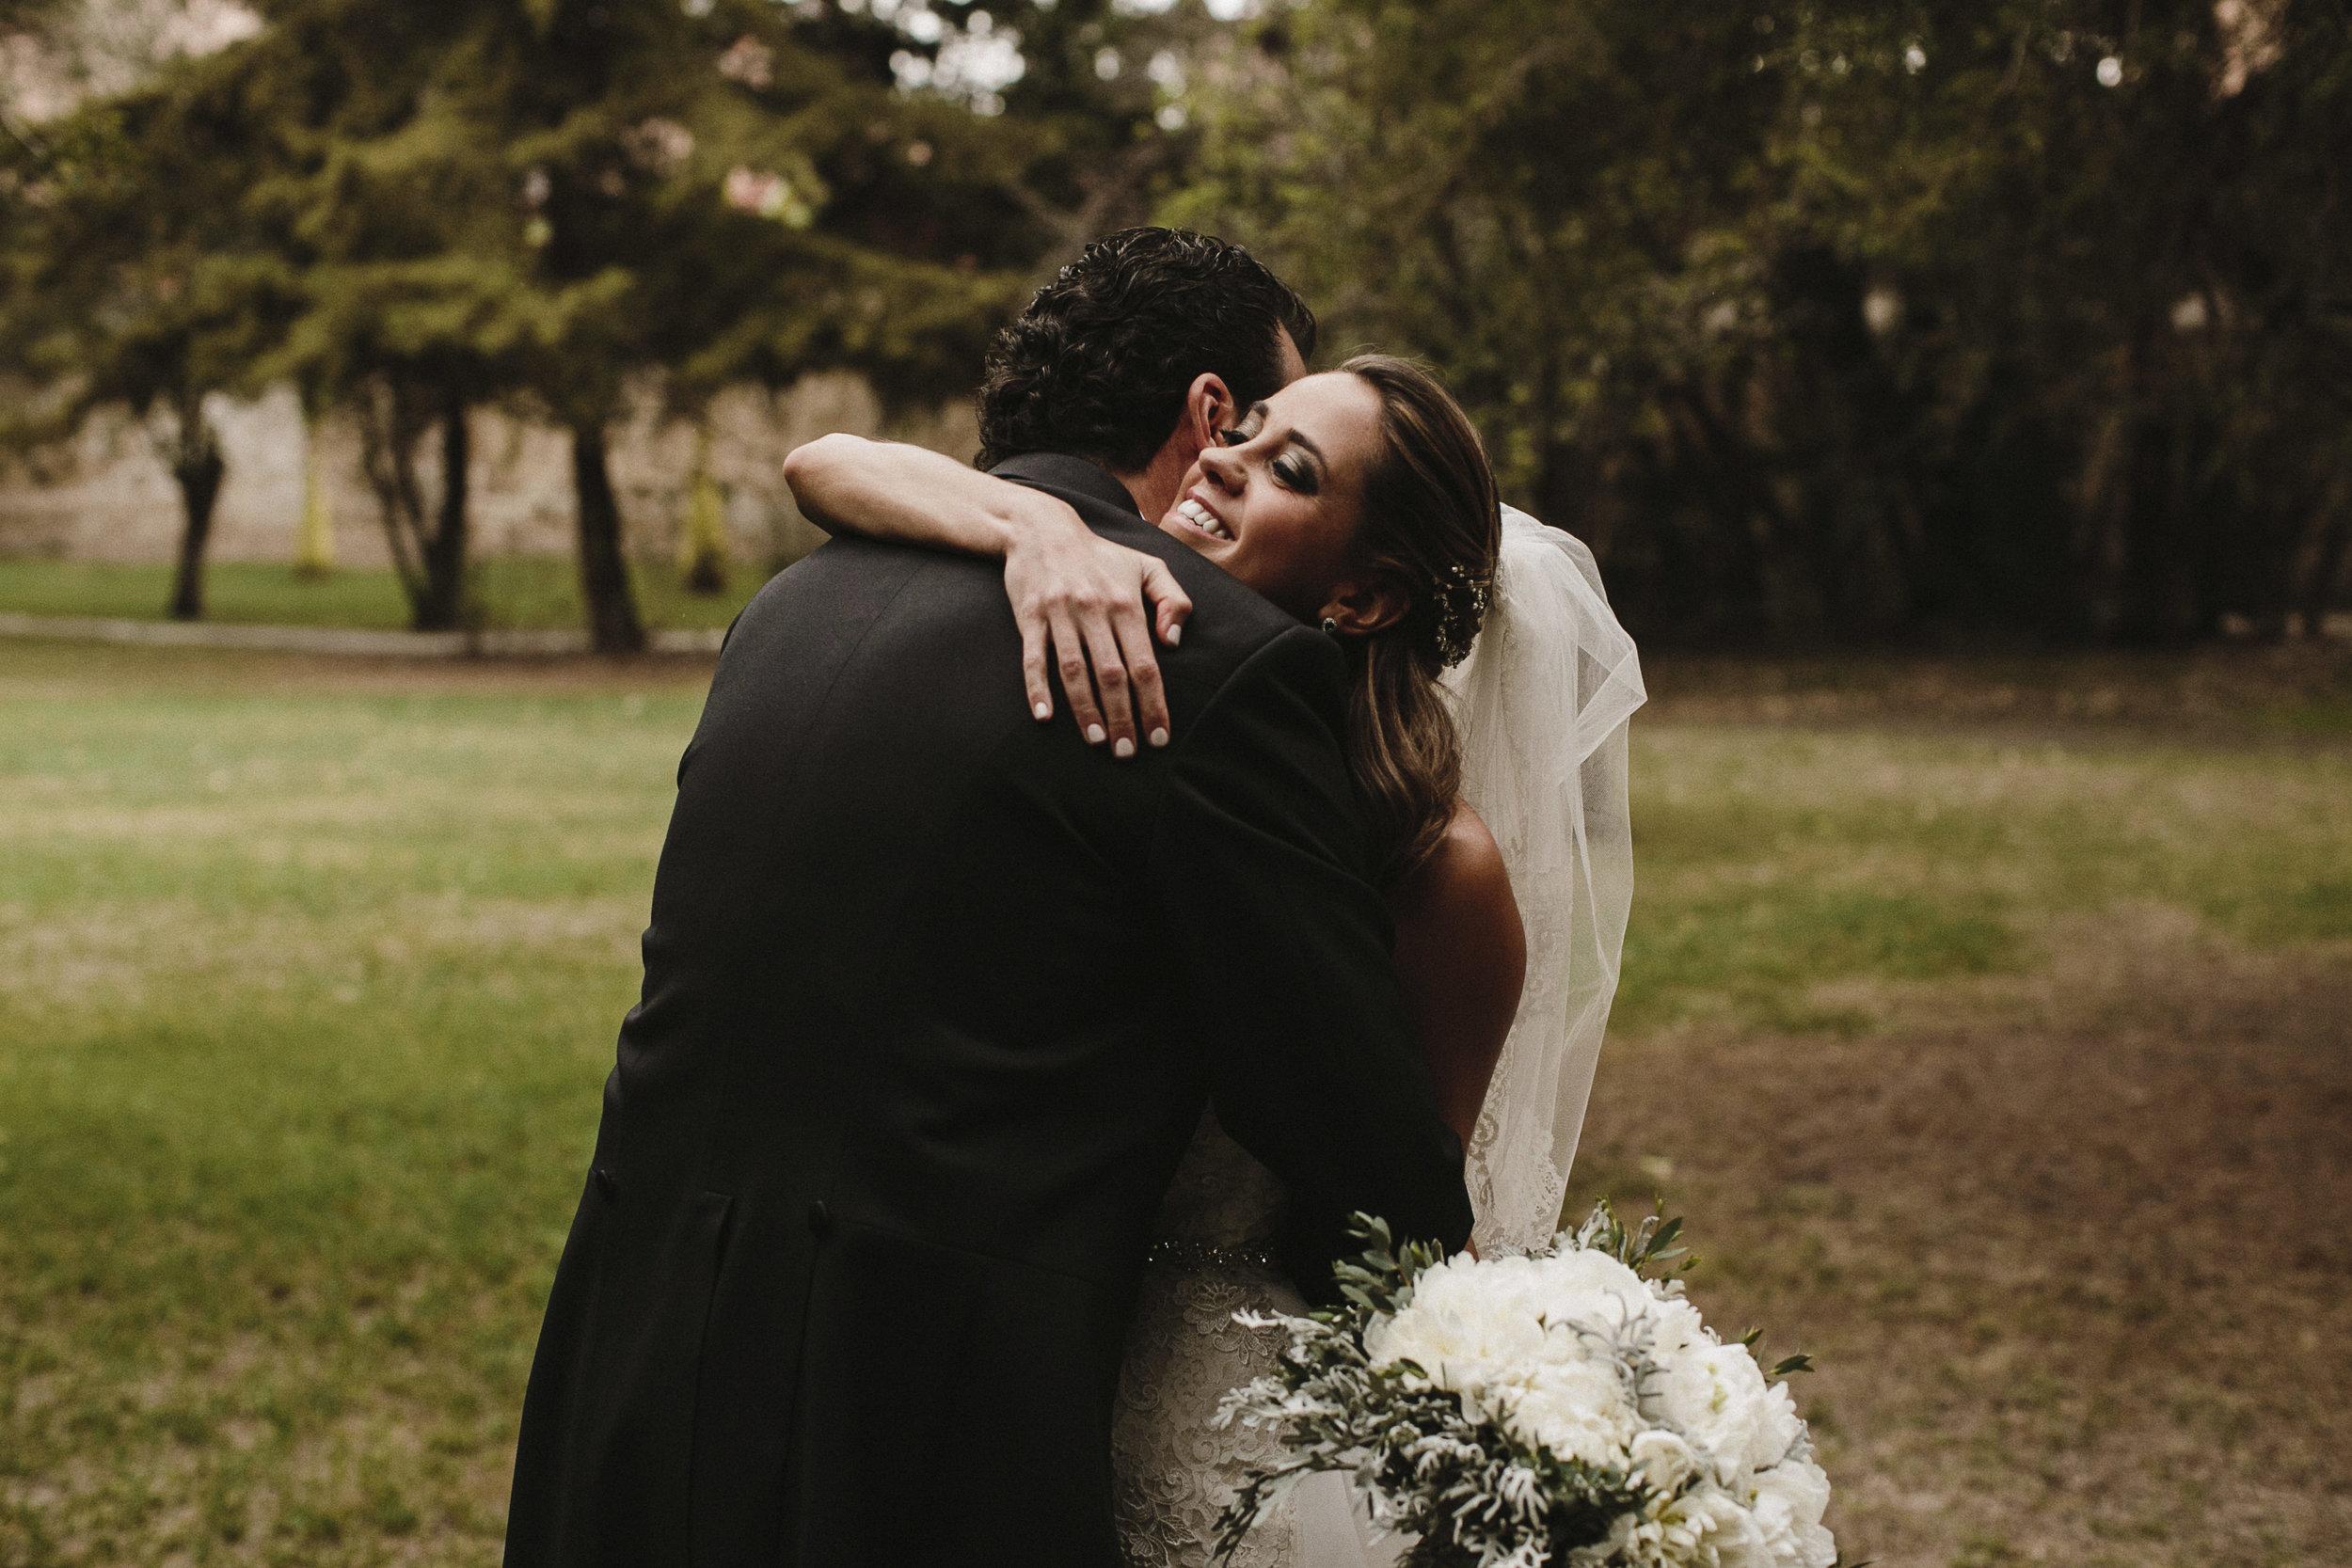 alfonso_flores_destination_wedding_photogrpahy_paola_alonso-172.JPG